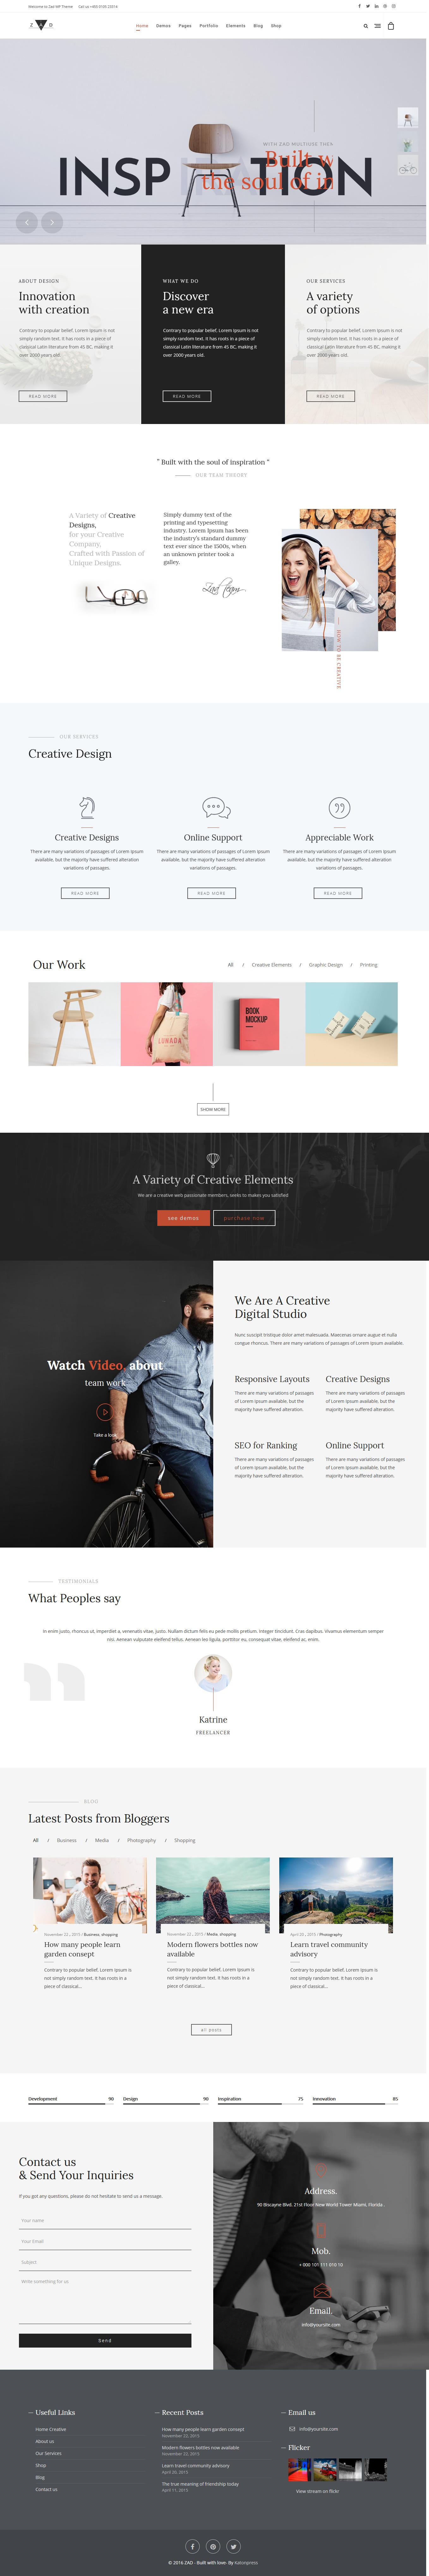 Zad – Best Premium Florist and Floriculture WordPress Theme